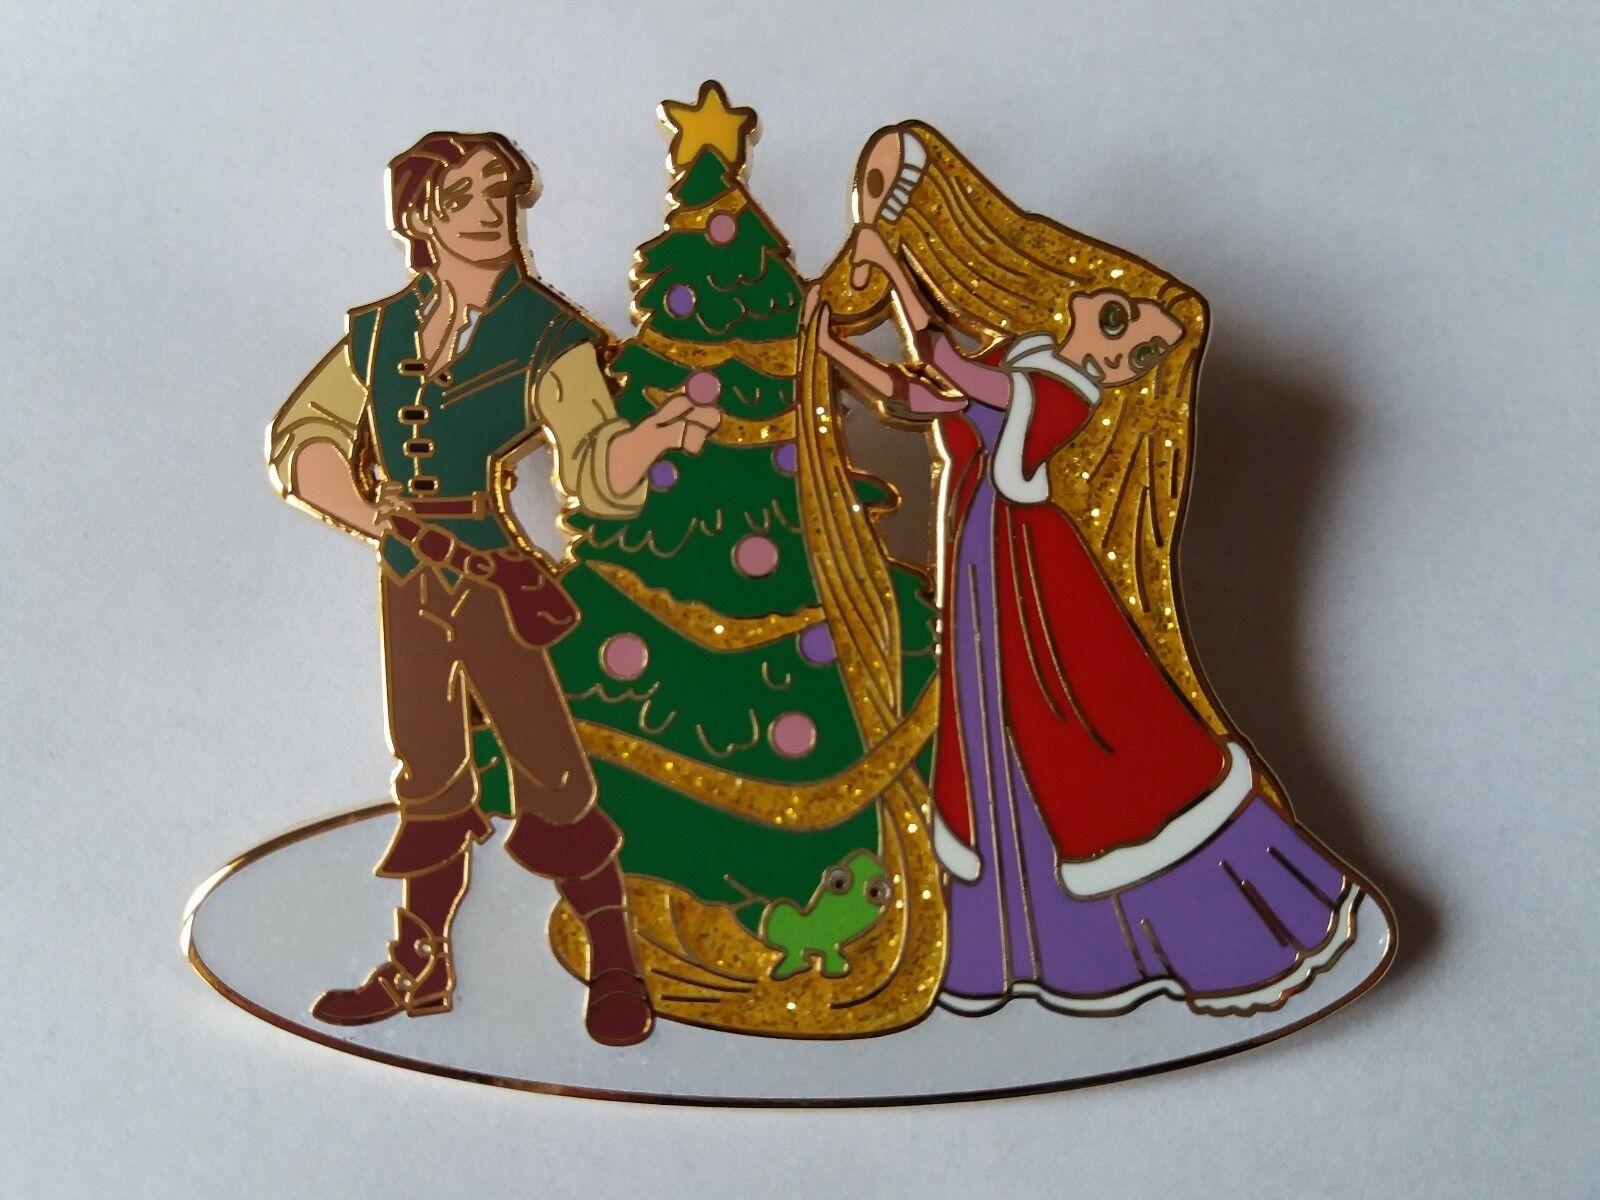 PINS DISNEY FANTASY PIN RAPUNZEL BRUSH FLYNN PASCAL CHRISTMAS TREE XMAS TANGLED